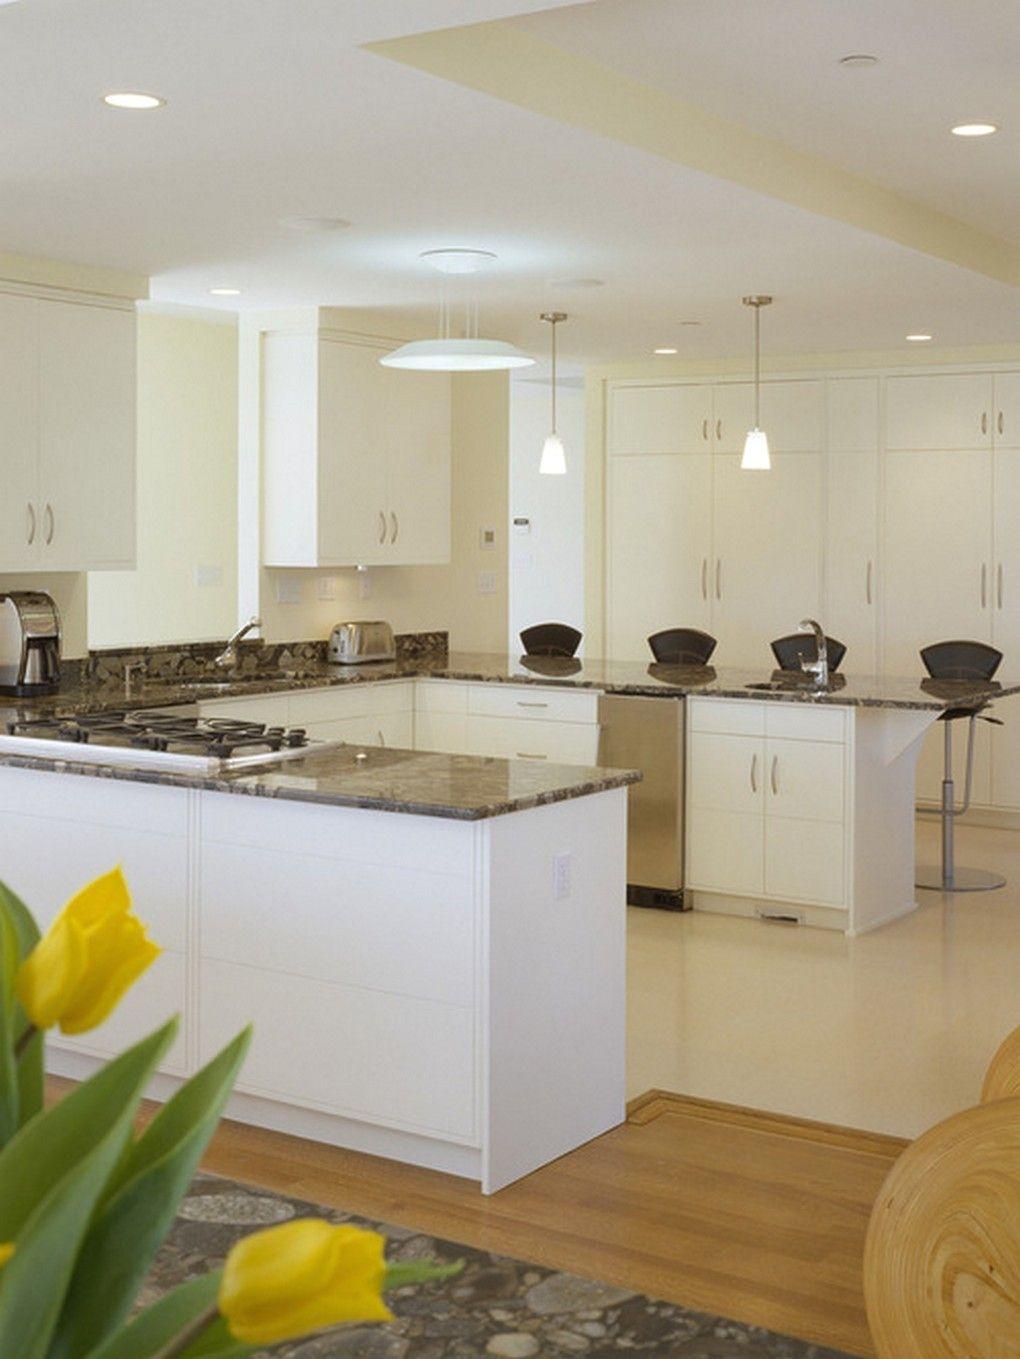 Pin on Kitchen Design Ideas | Kitchen Cabinets, Contemporary ...